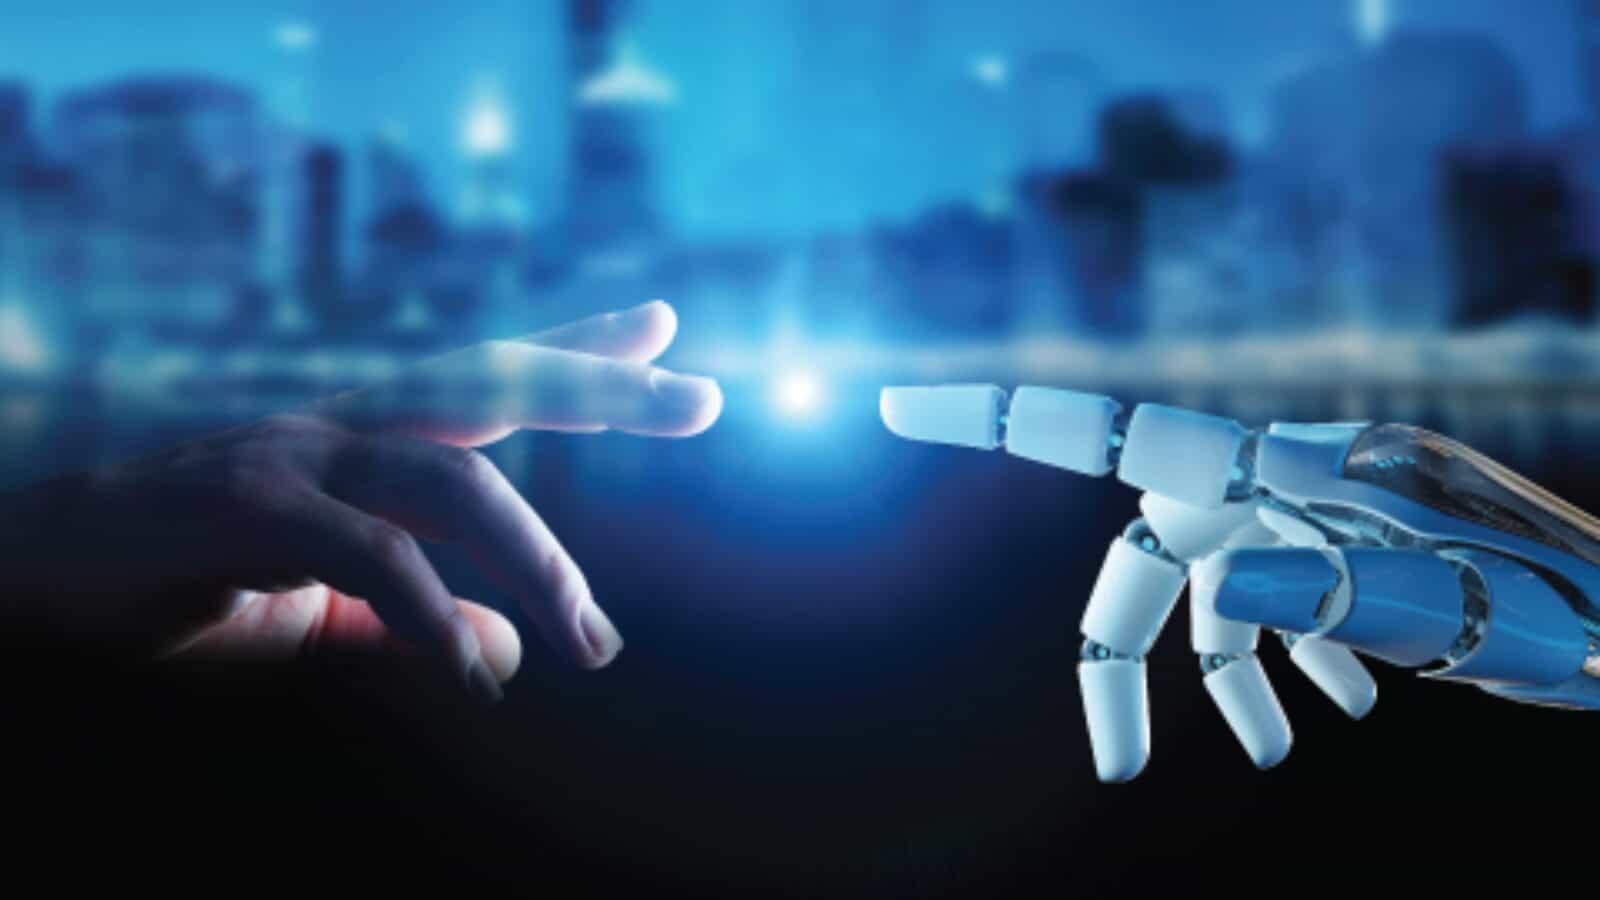 DC Call: Digital 4.0 Technologies - Digital Twins & The Virtual Enterprise